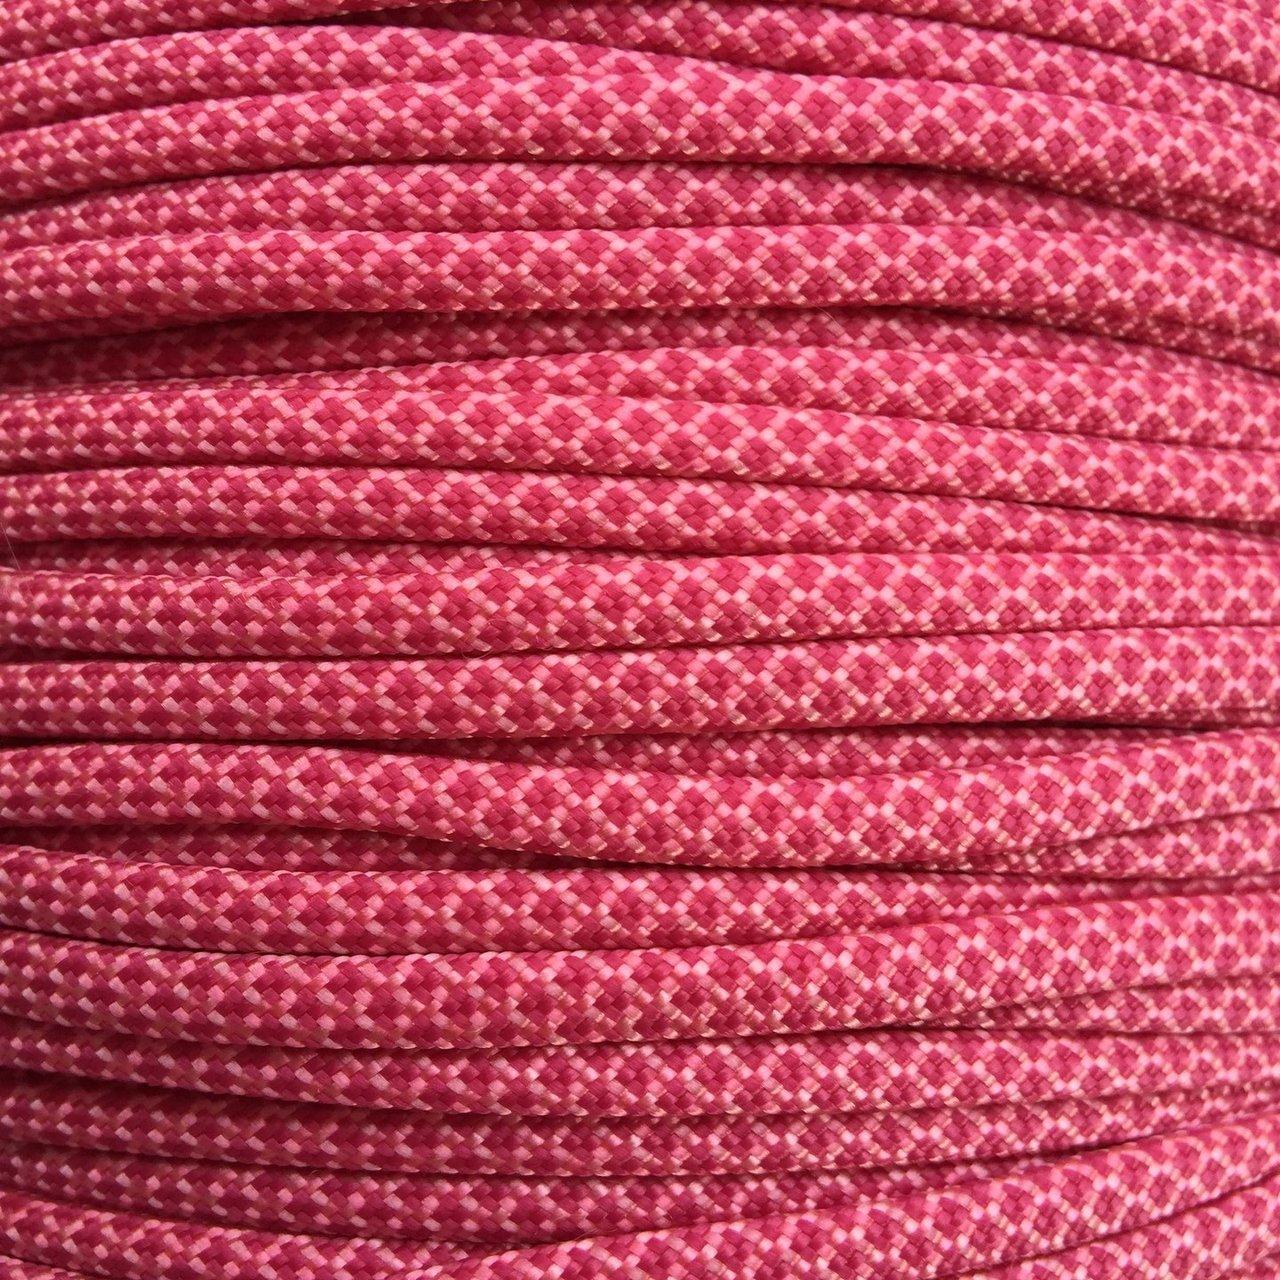 Rose Pink & Fuchsia Diamonds Paracord Type III